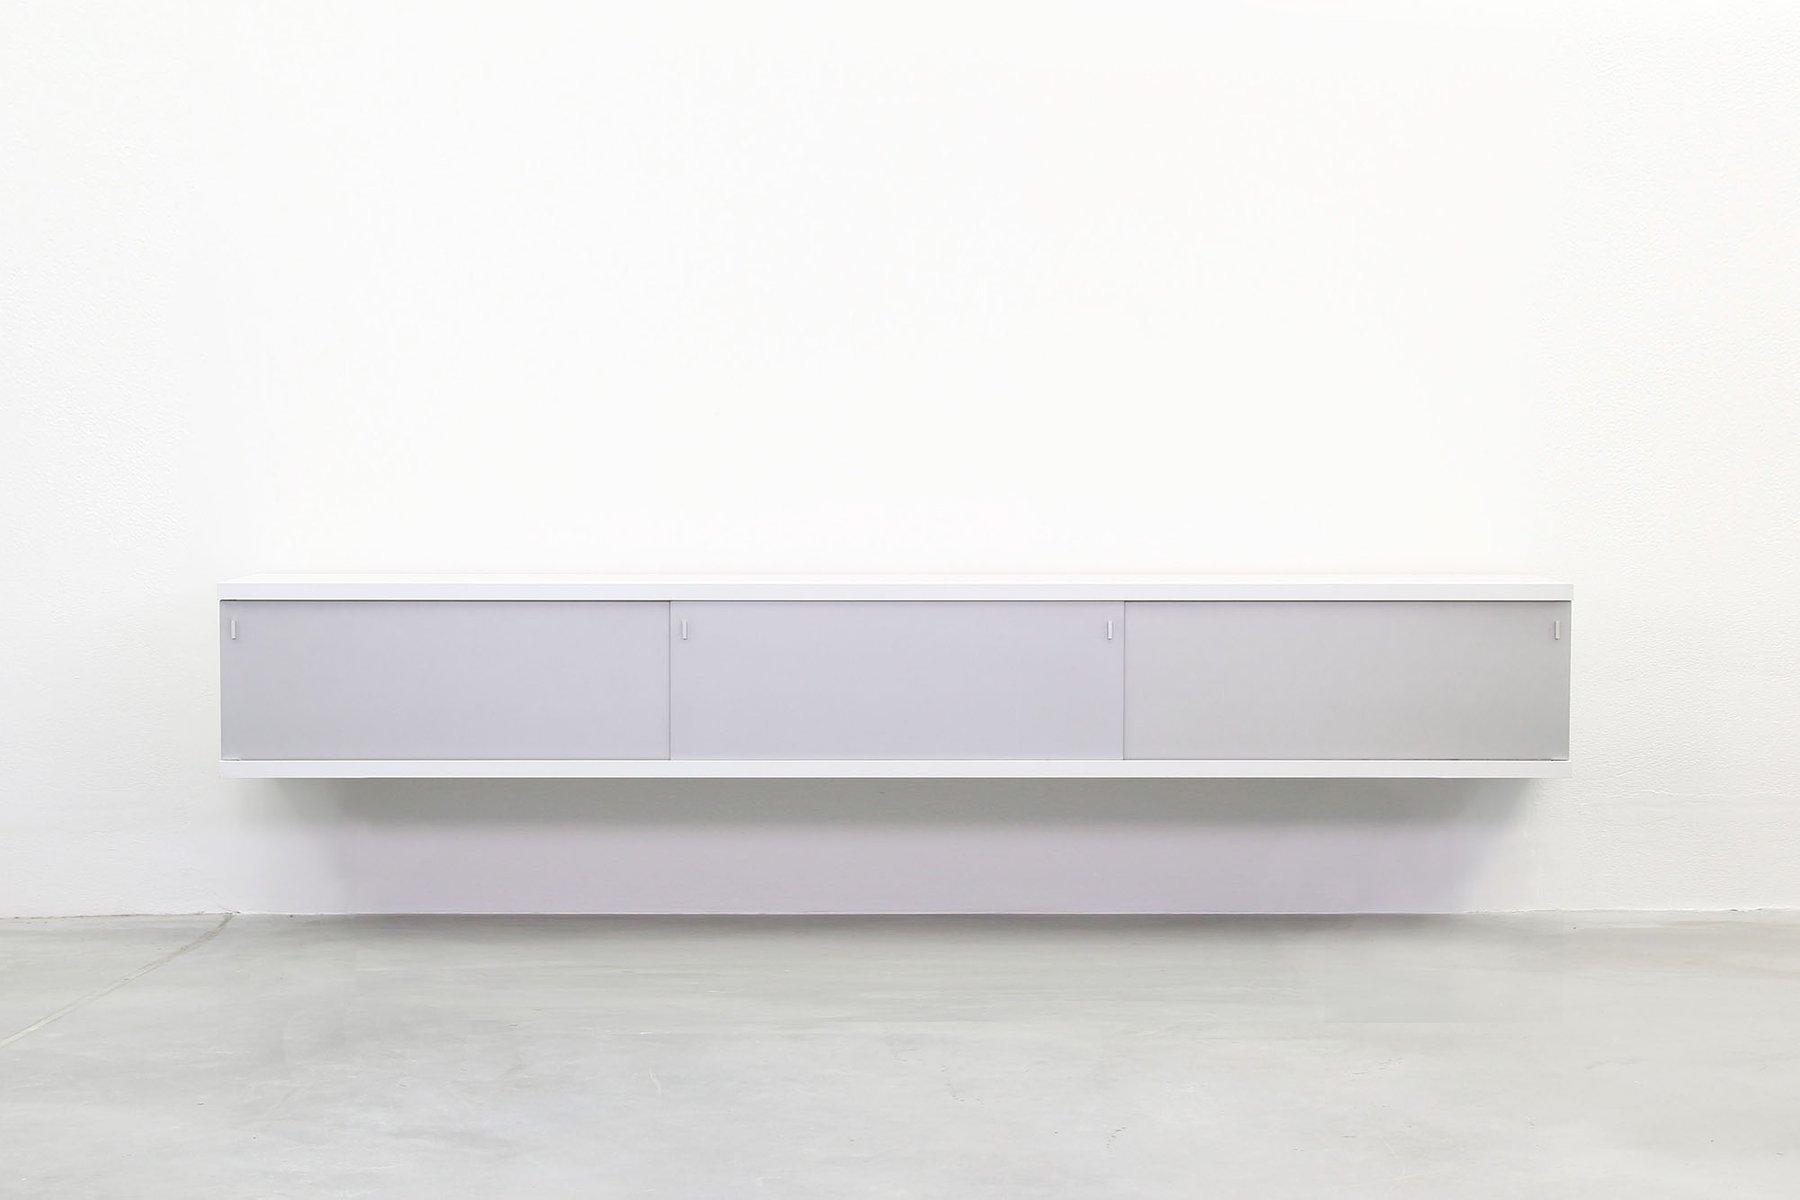 h ngendes sideboard von horst br ning f r behr 1967 bei pamono kaufen. Black Bedroom Furniture Sets. Home Design Ideas